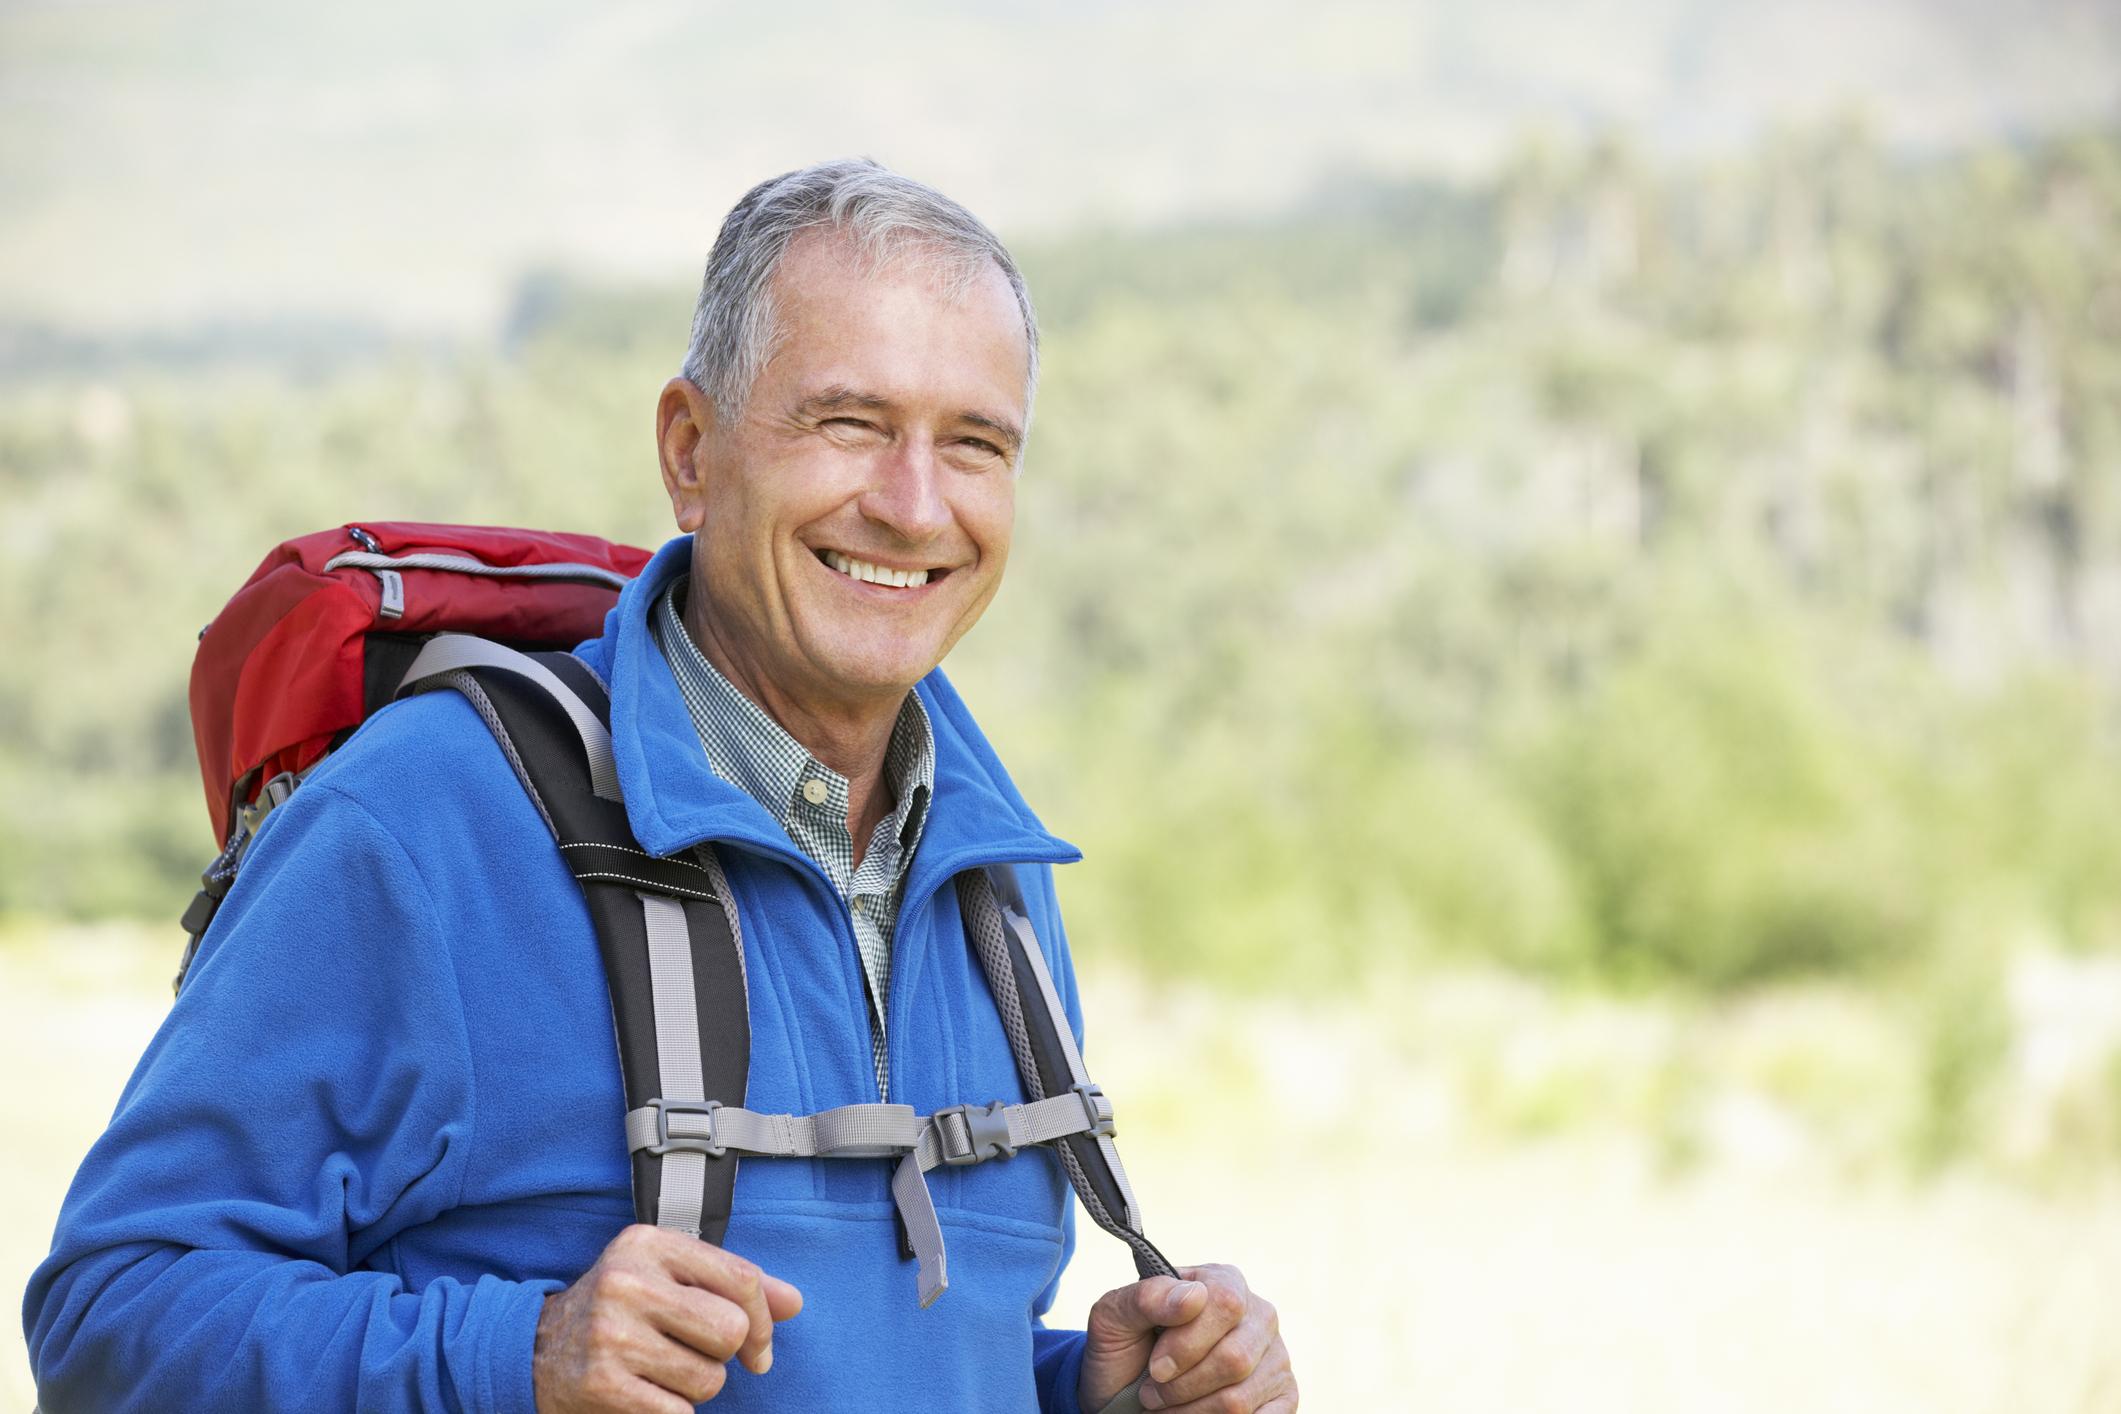 Senior man backpacking